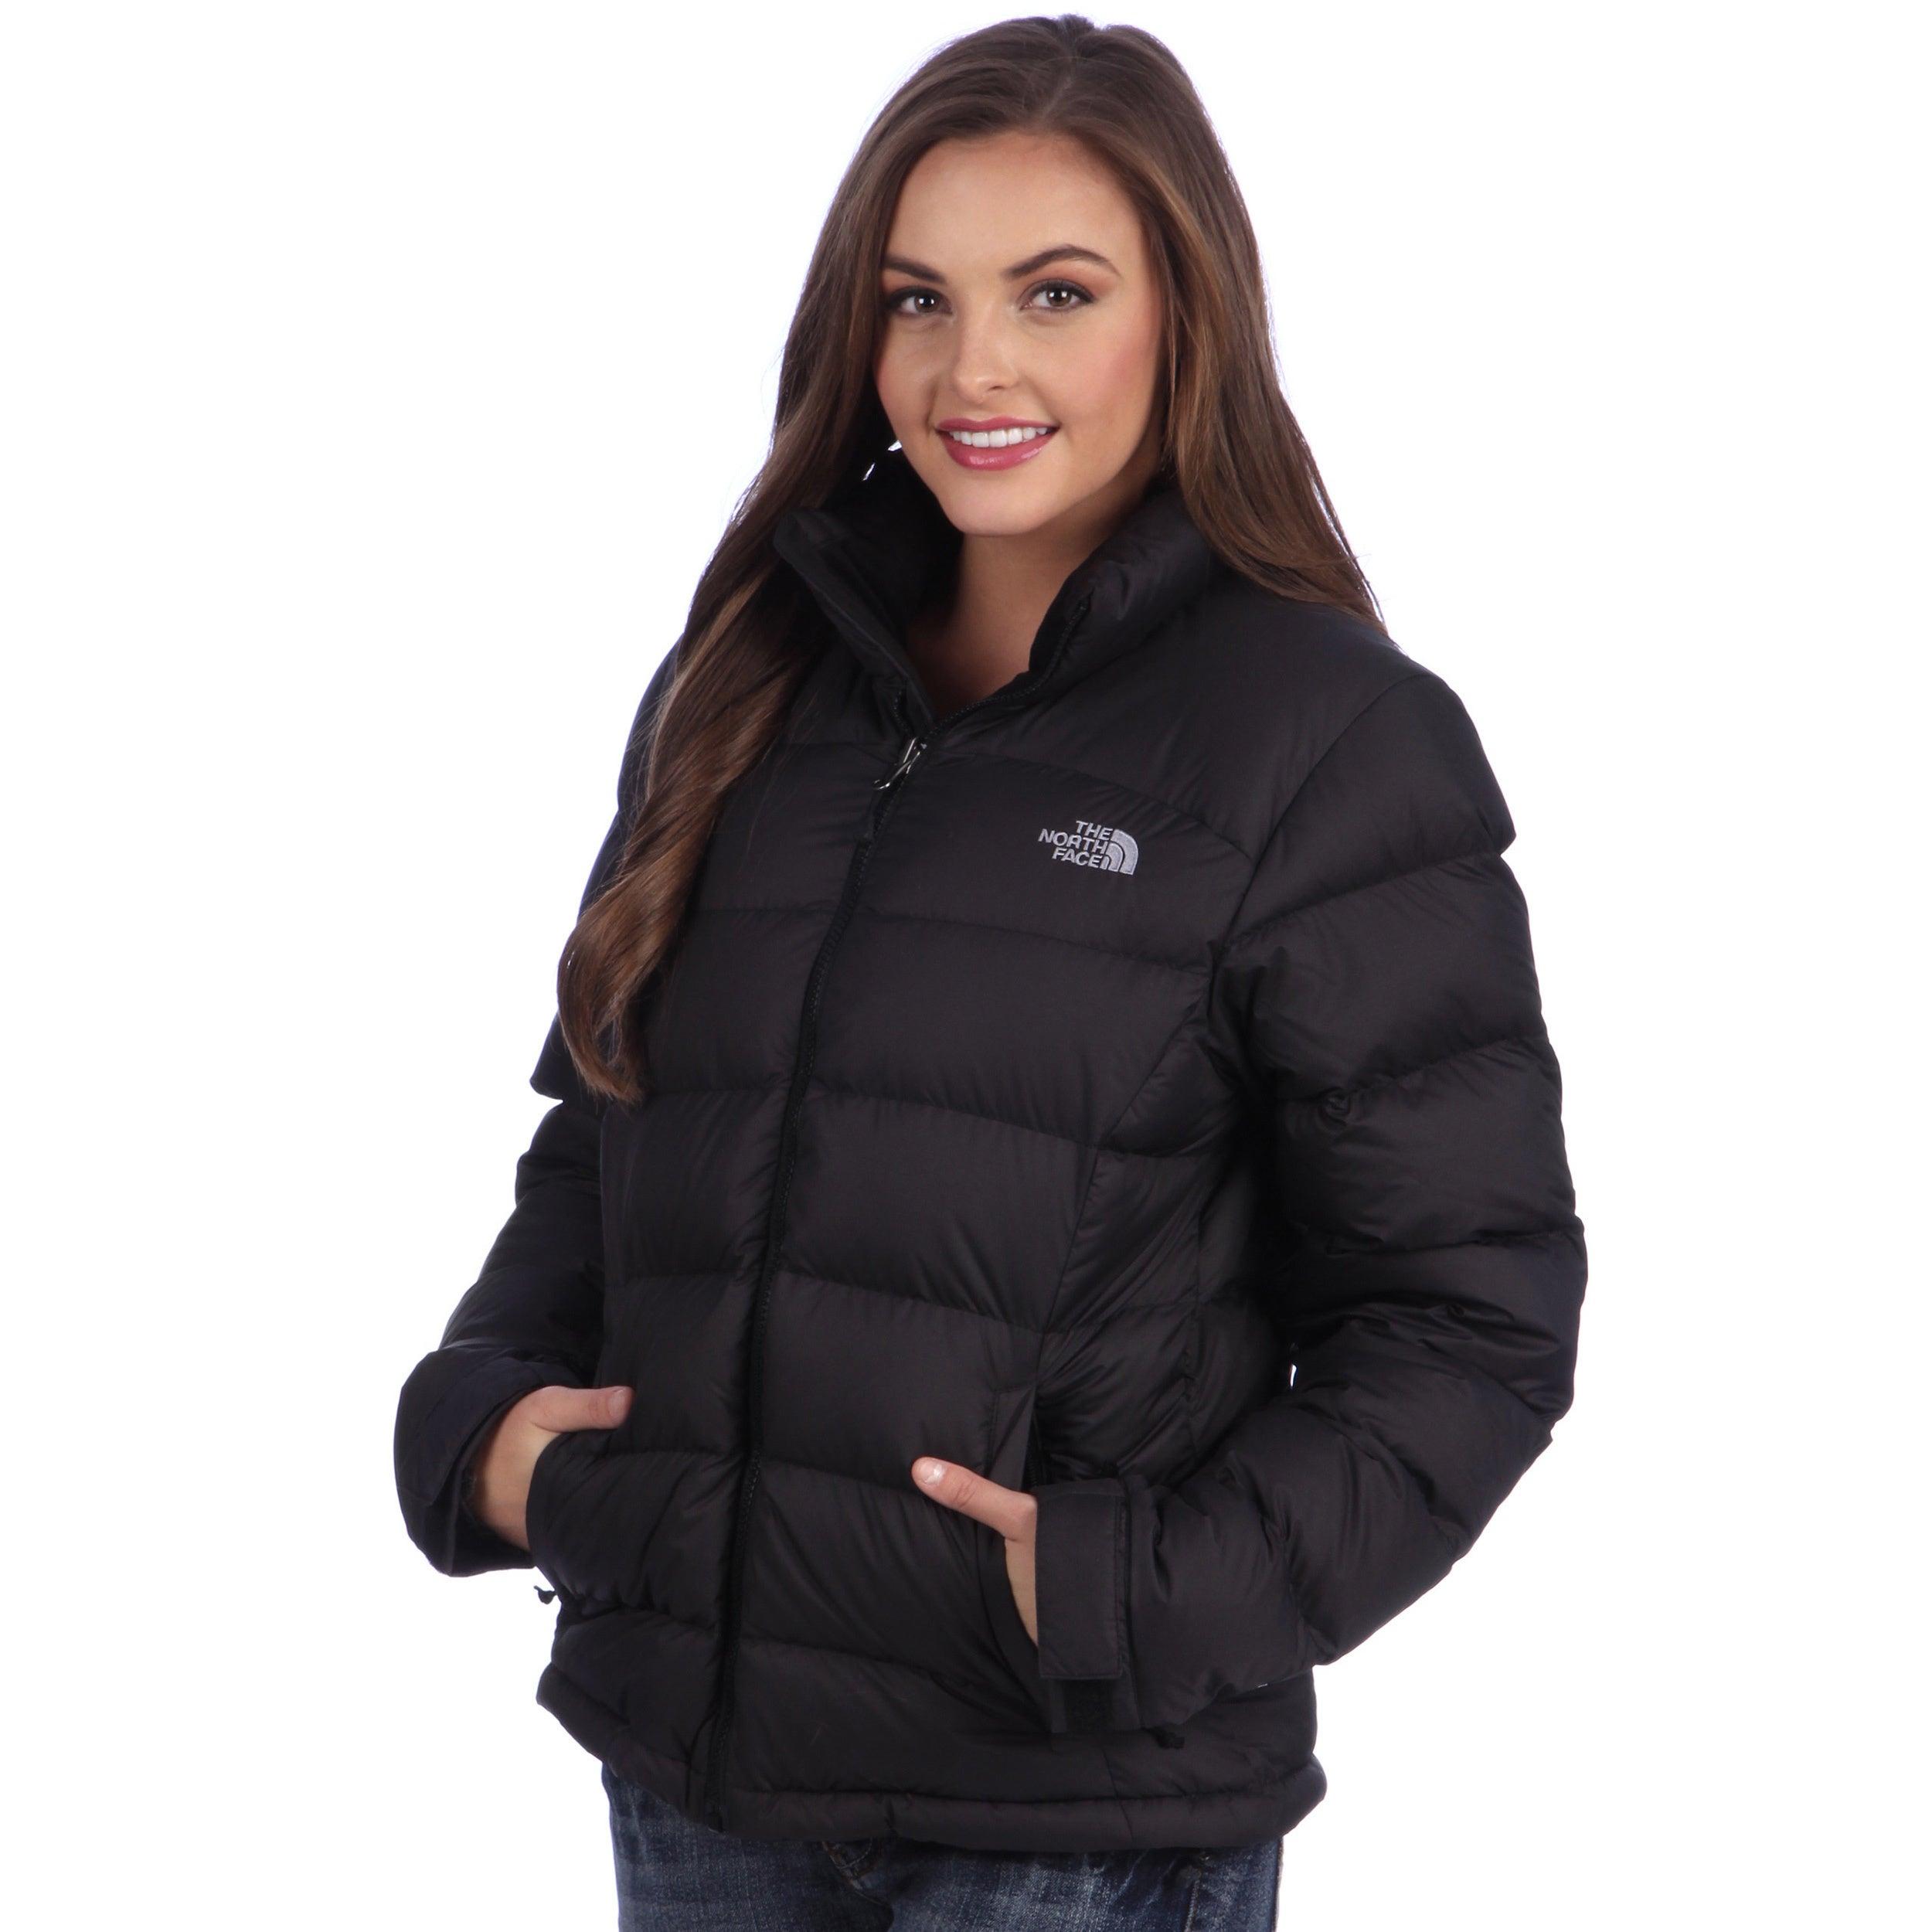 Shop The North Face Women s Black  Nuptse 2  Jacket - Free Shipping ... 8a3440cc1c